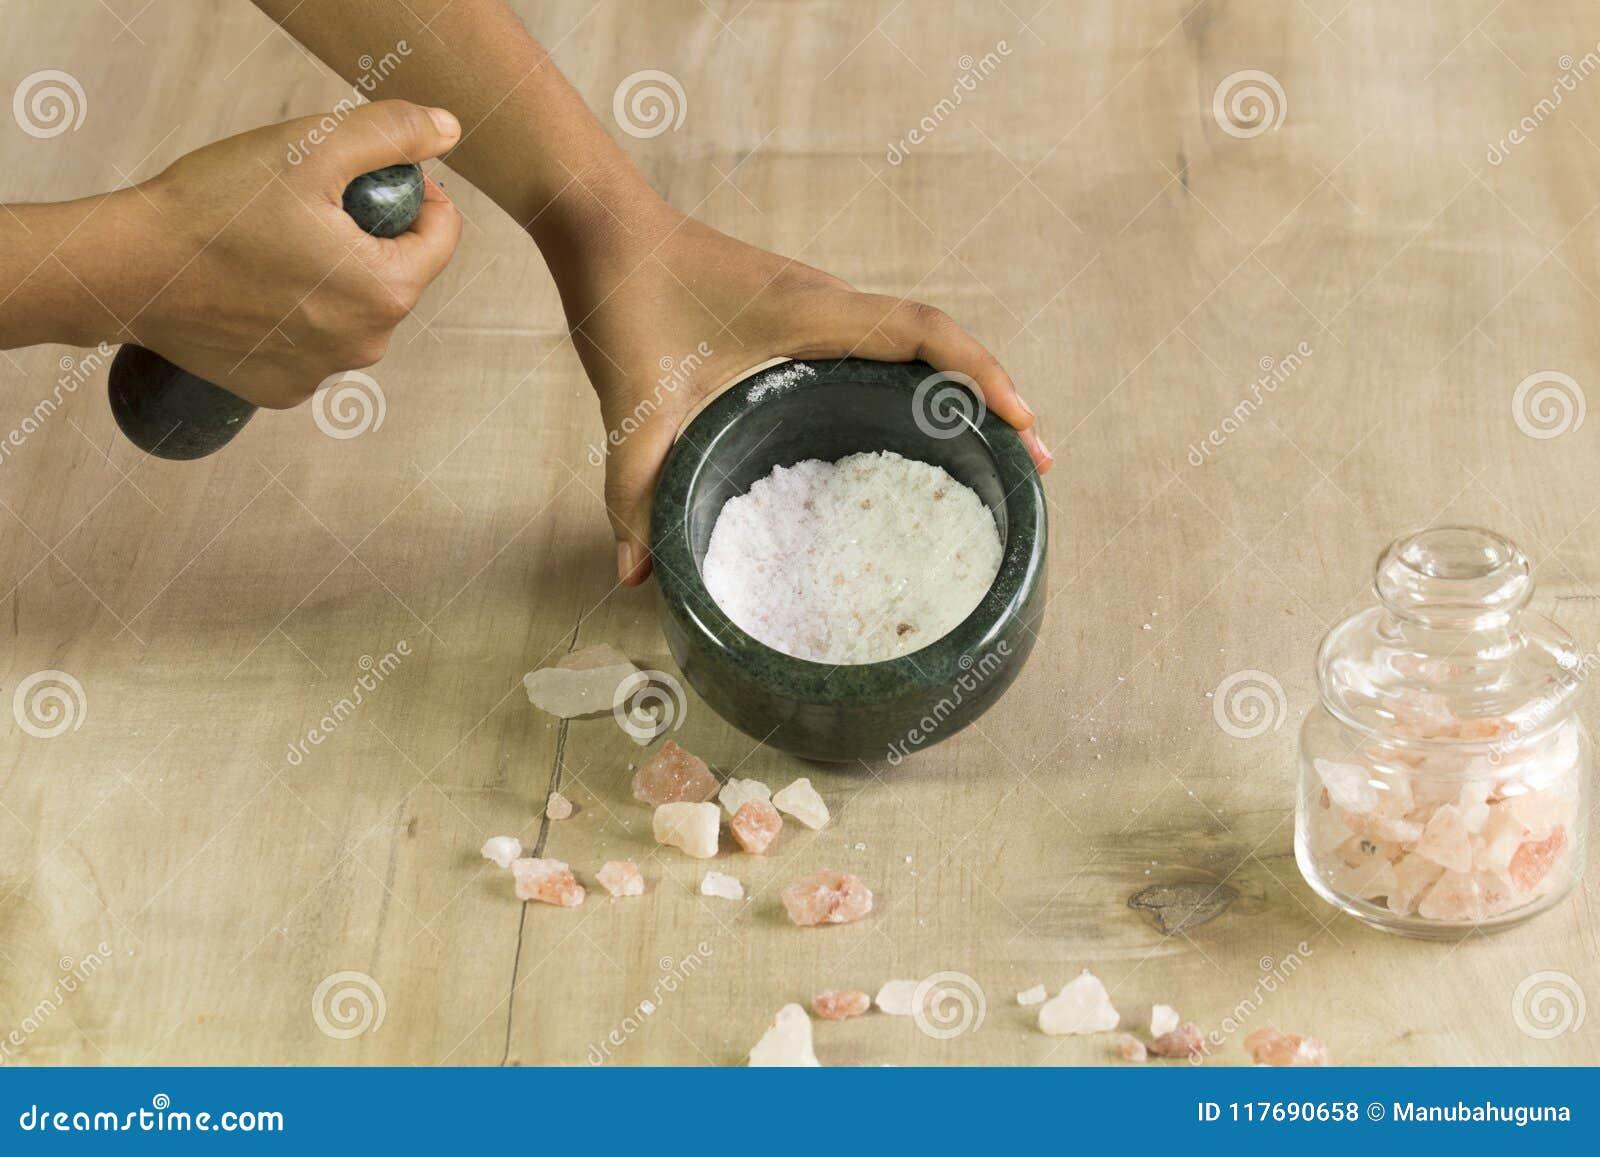 Crushed rock salt stock photo  Image of cuisine, taste